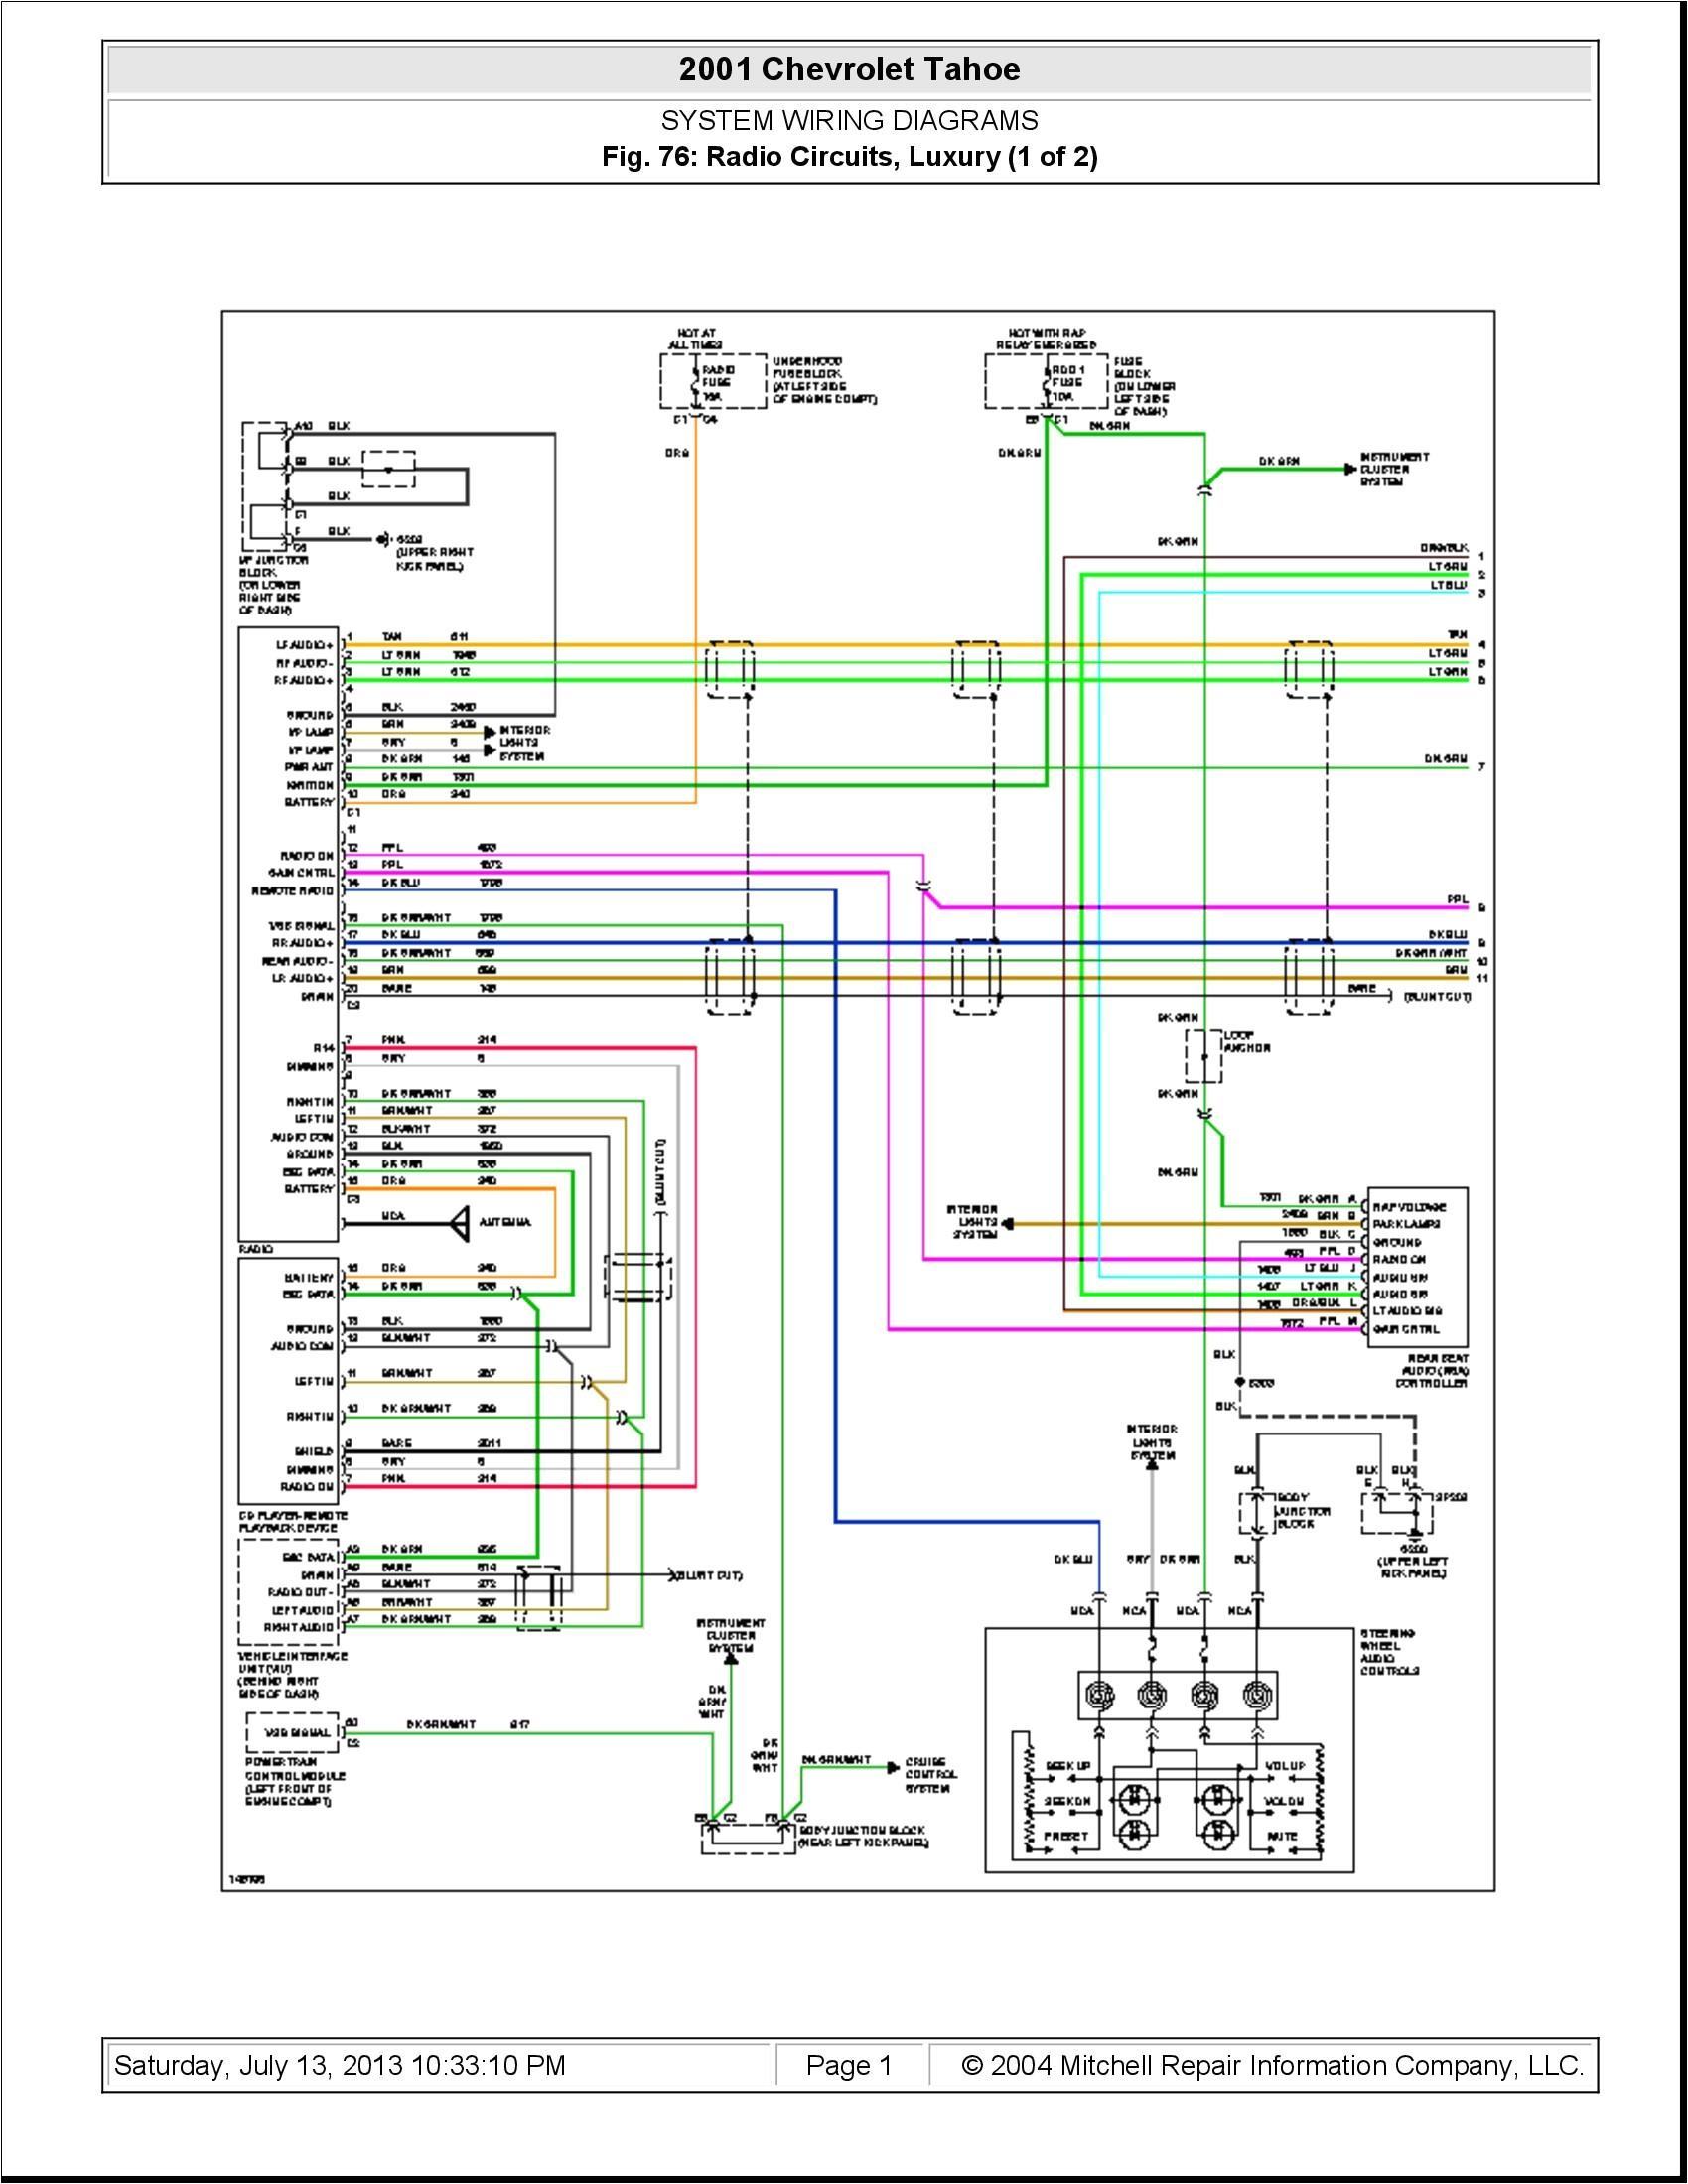 1995 chevrolet s10 wiring diagram wiring diagram toolbox 95 s10 starter wiring diagram 1995 s10 starter diagram